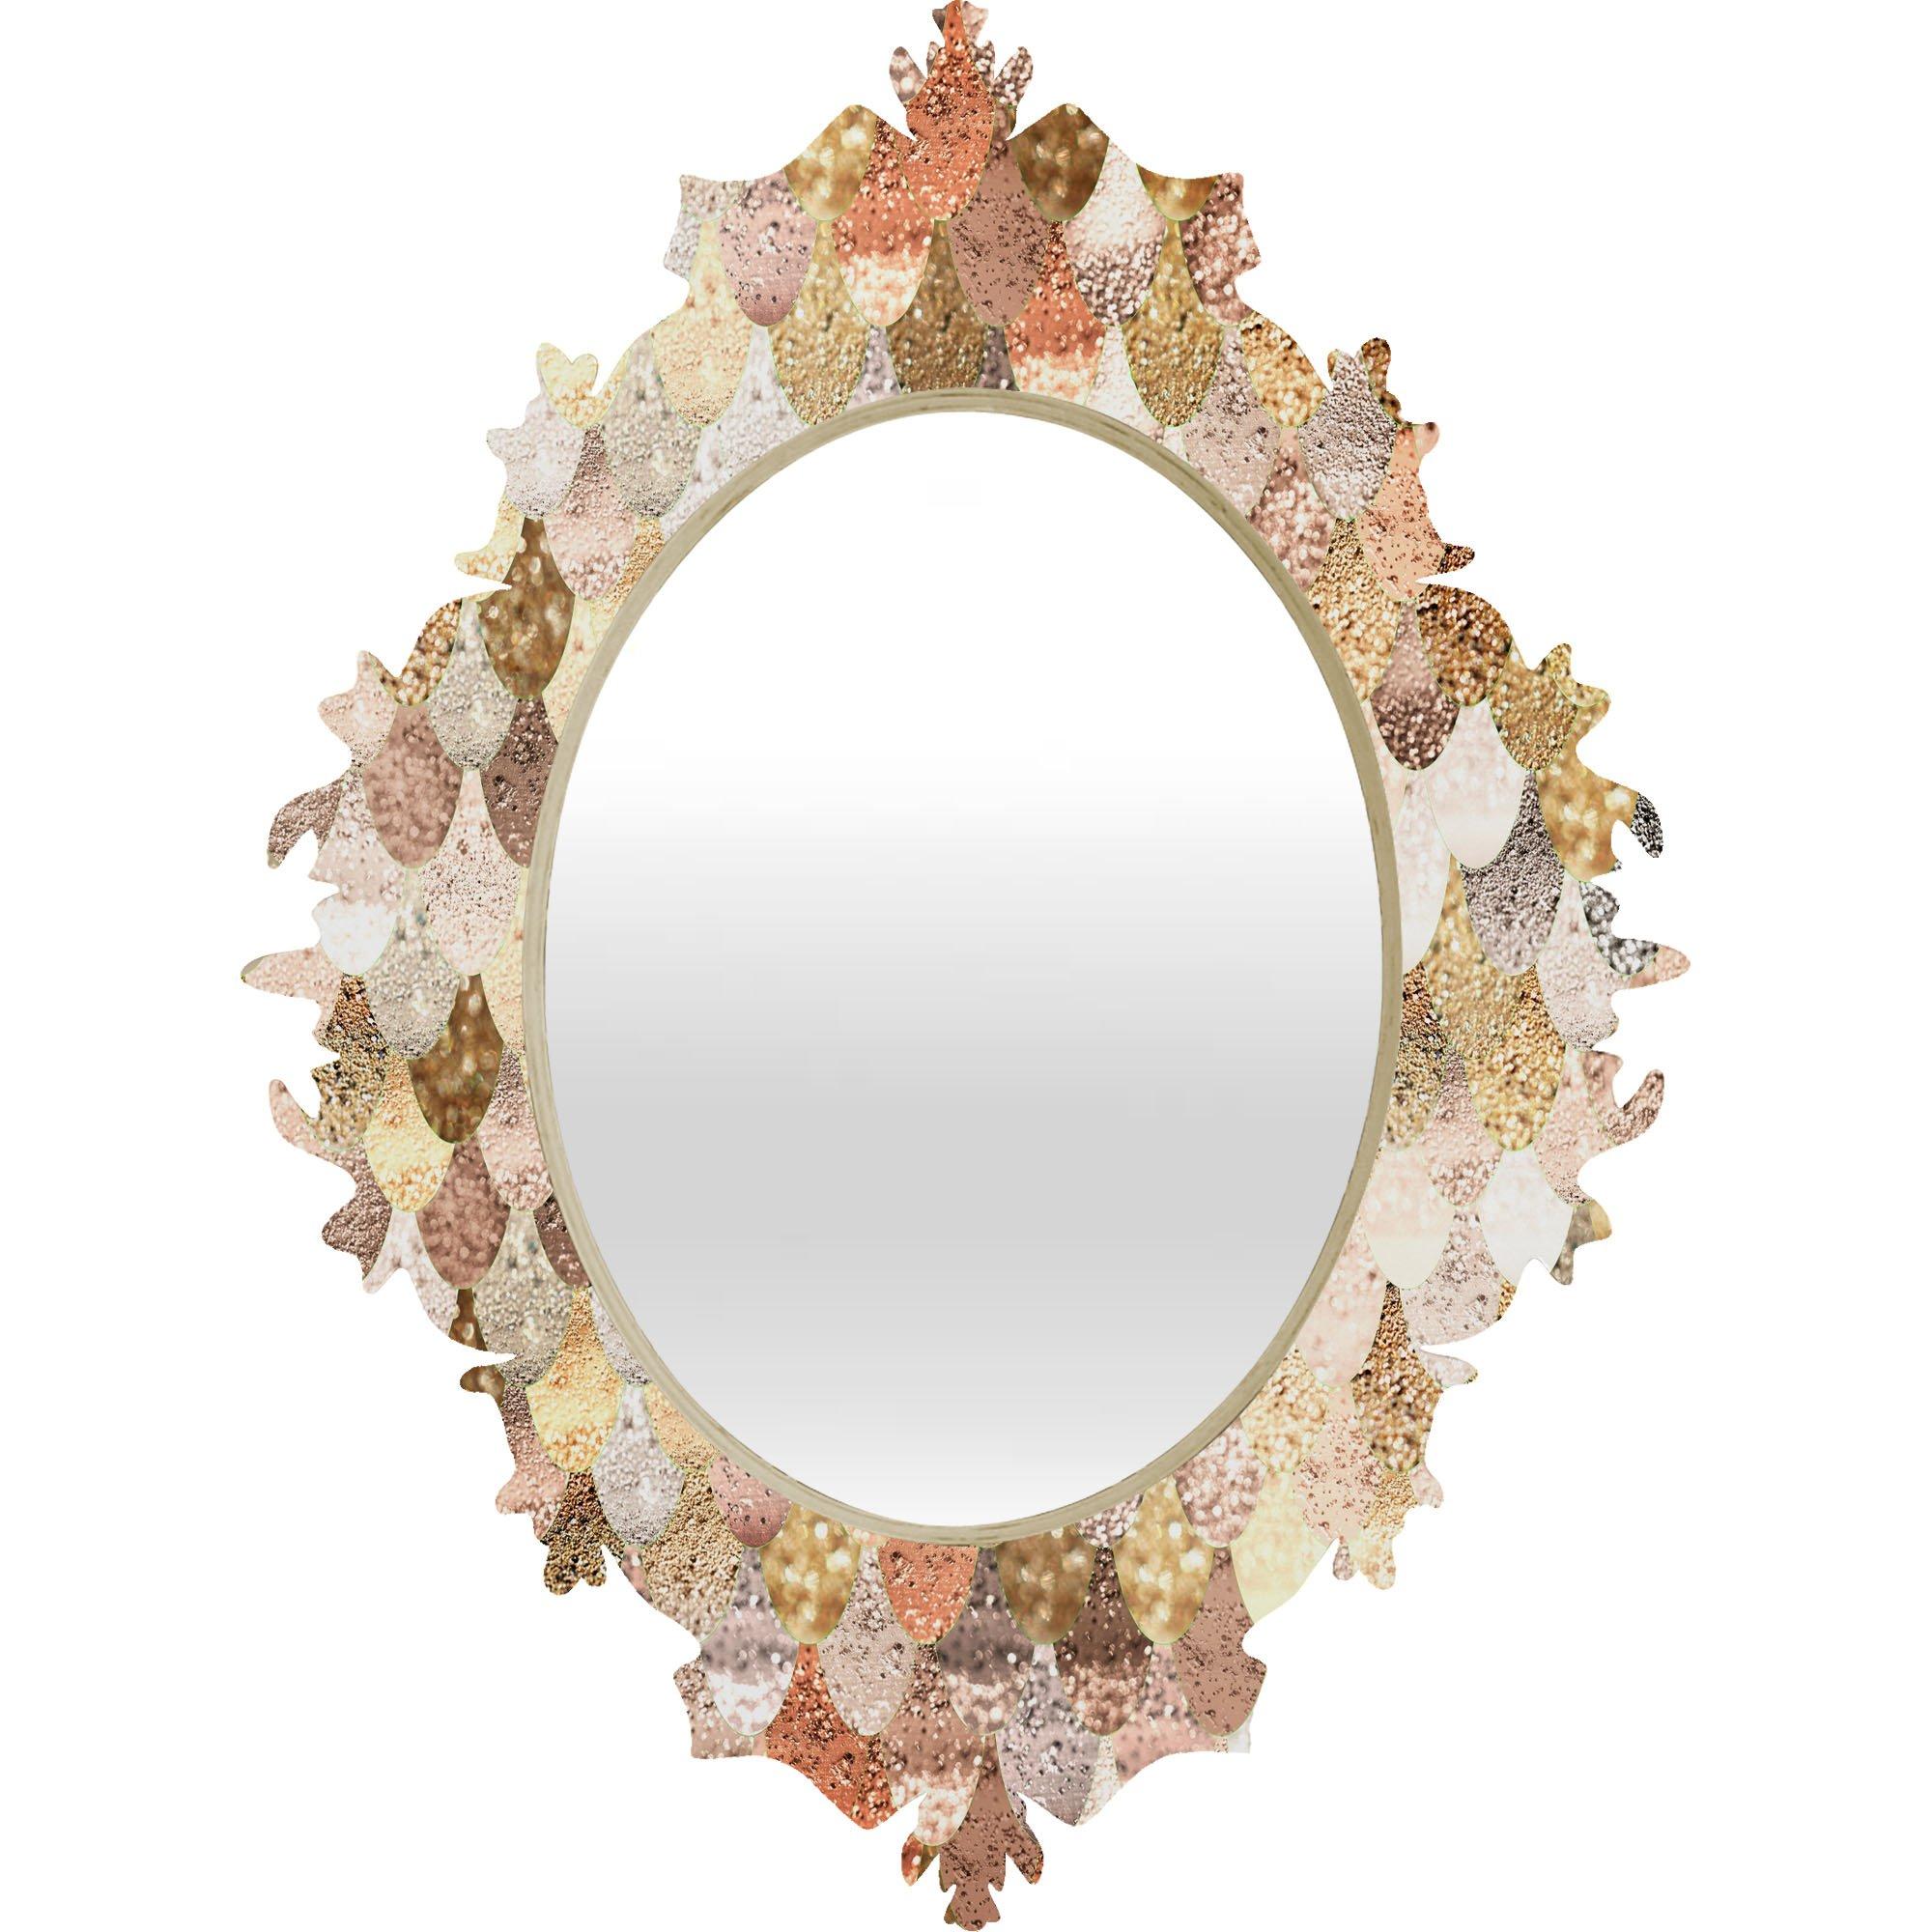 Deny Designs Monika Strigel Really Mermaid Gold Baroque Mirror, 19 x 14